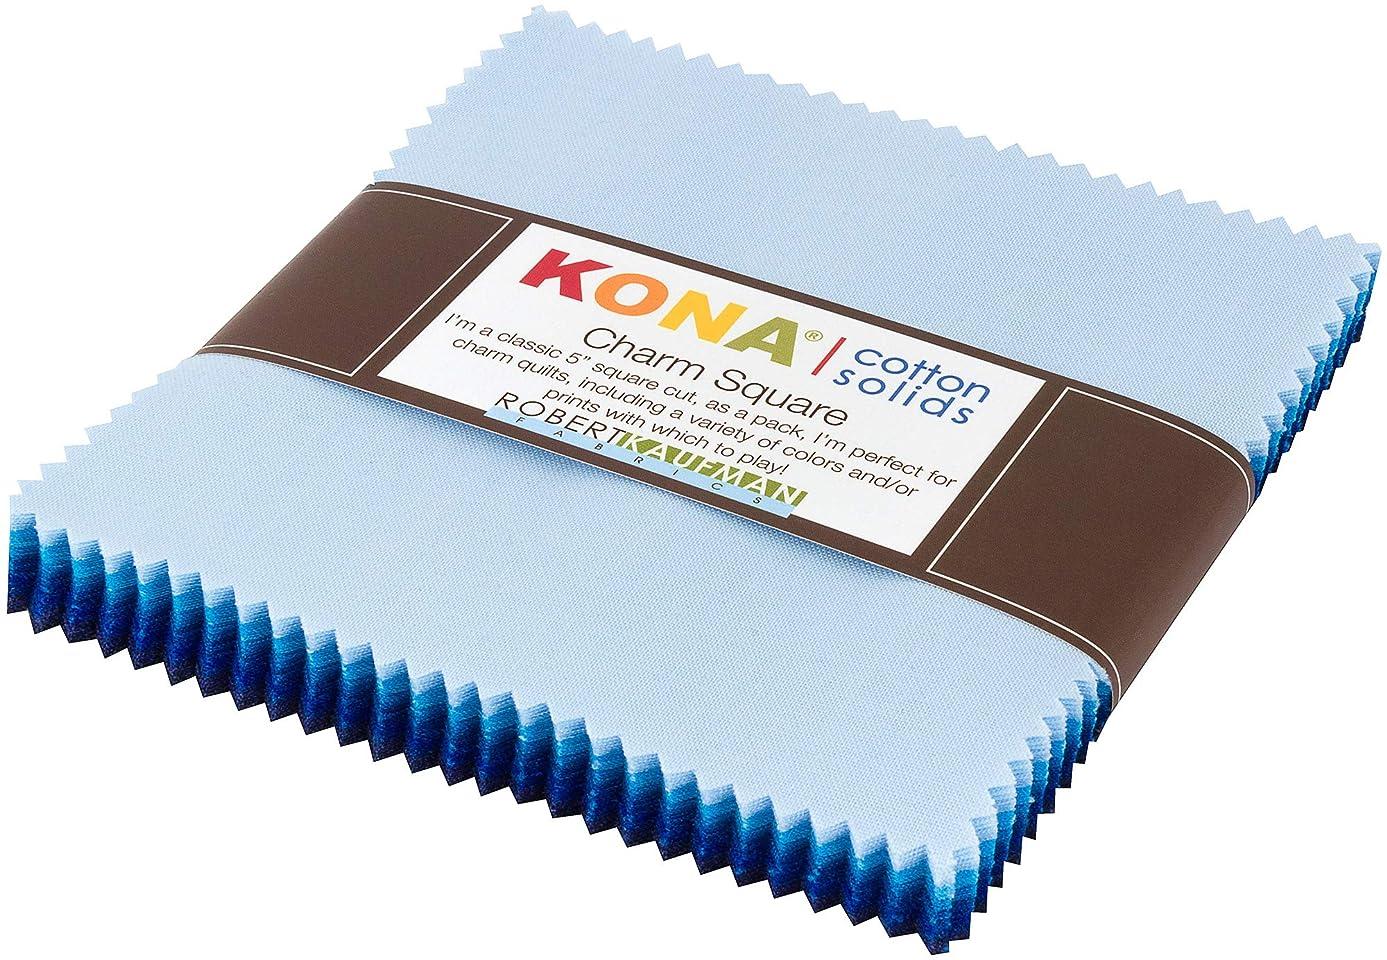 Kona Cotton Solids Waterfall Charm Square 42 5-inch Squares Charm Pack Robert Kaufman CHS-732-42